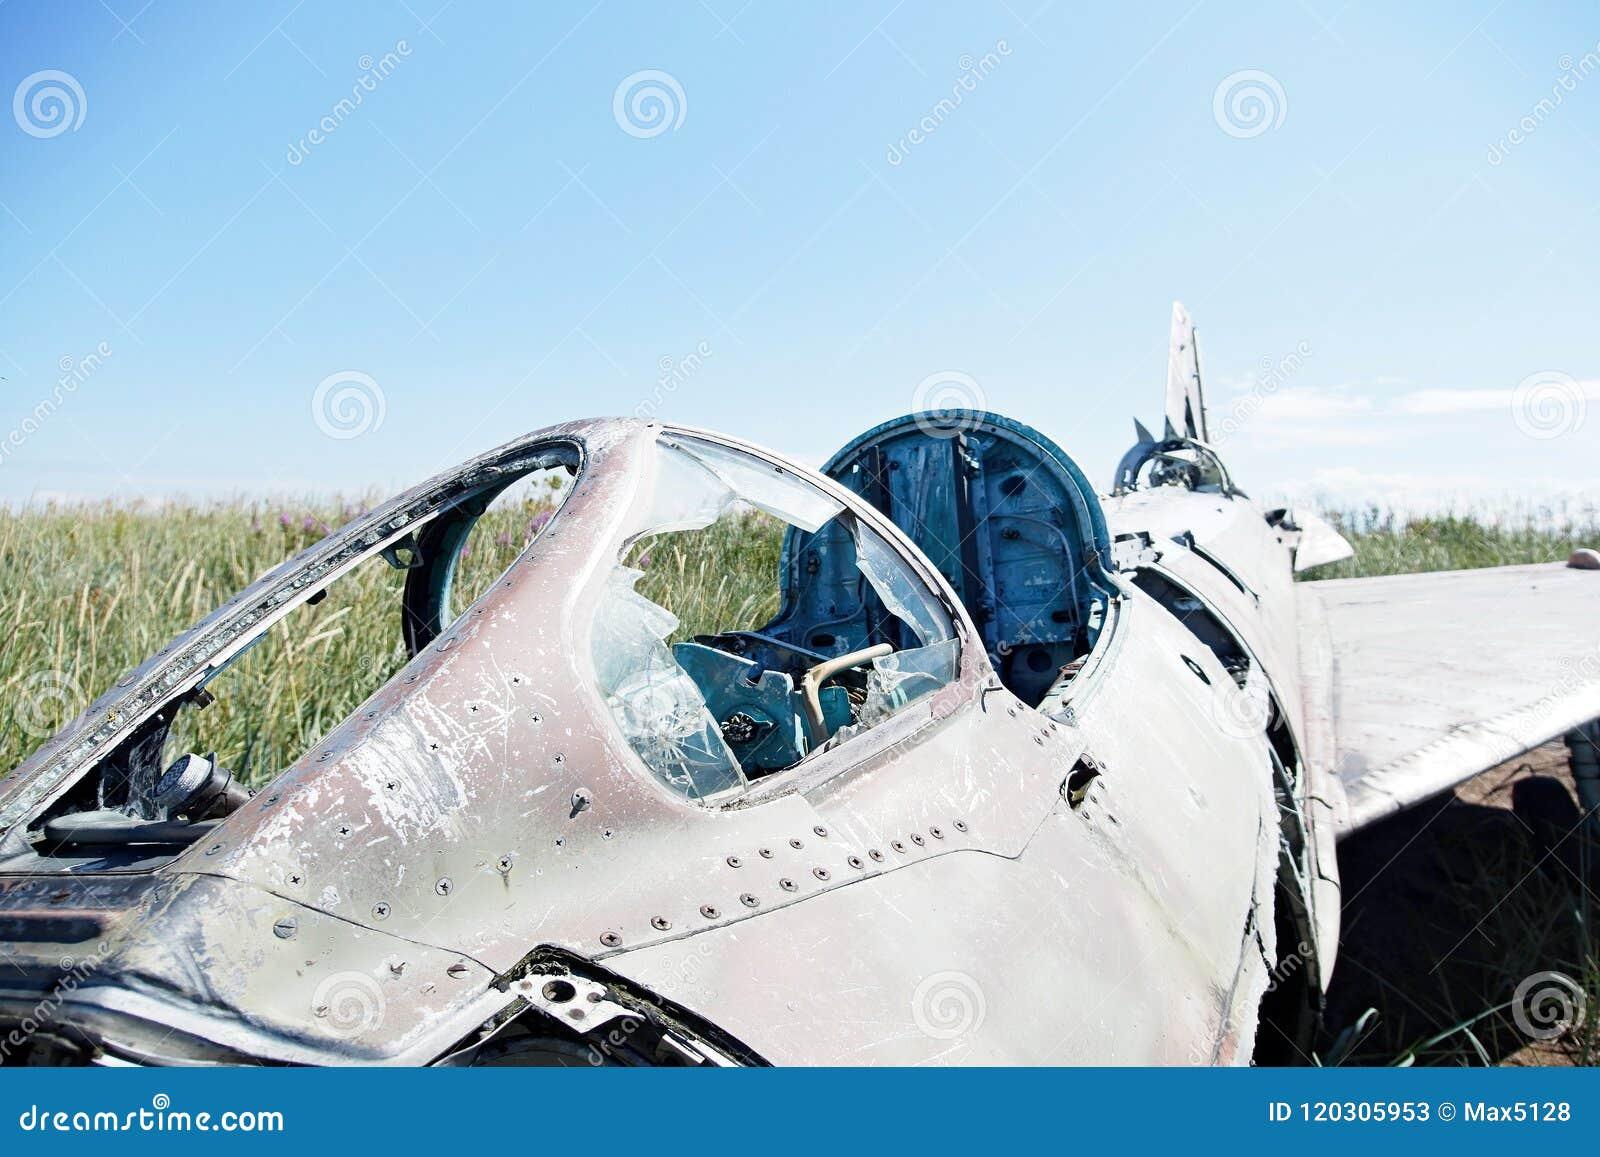 Delar av kraschat flygplan på en naturlig bakgrund av vegetation